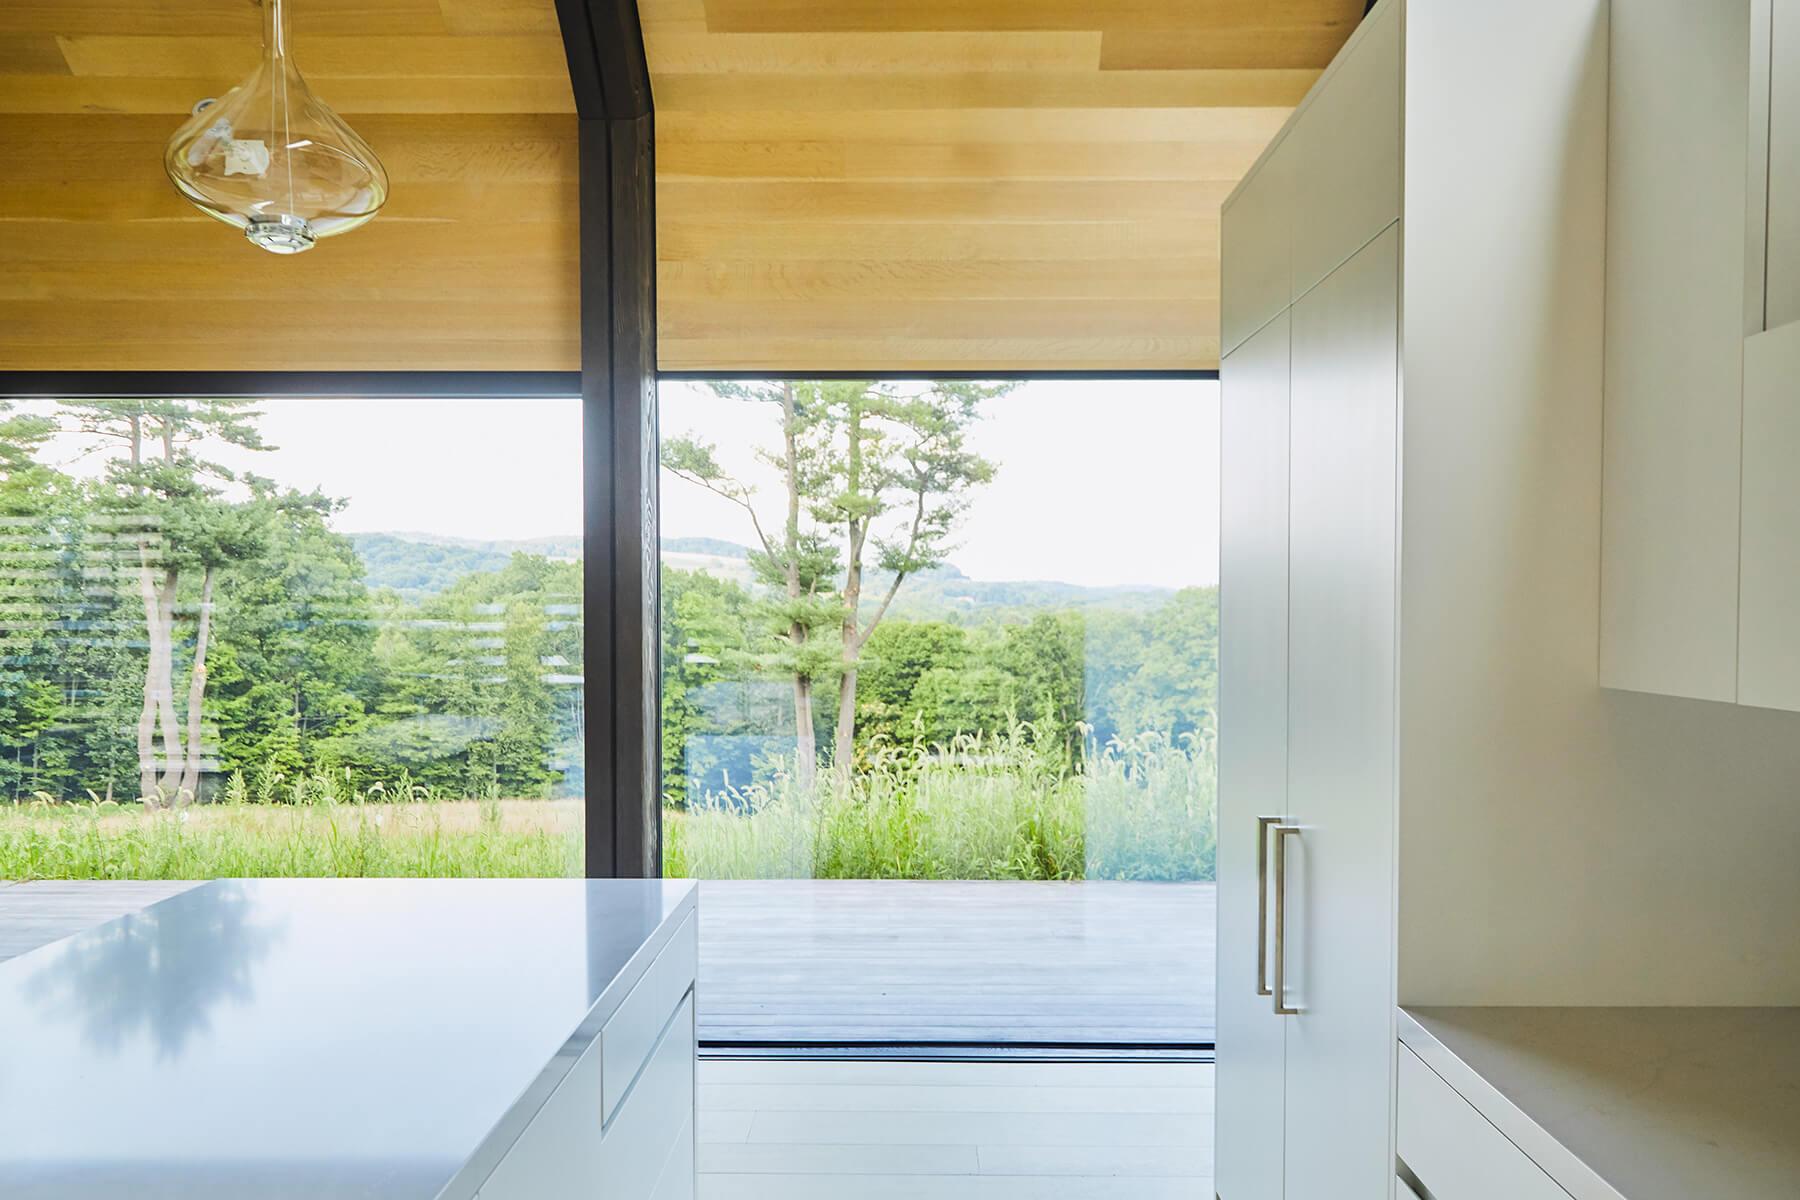 Mountain House, Columbia County, New York – USA